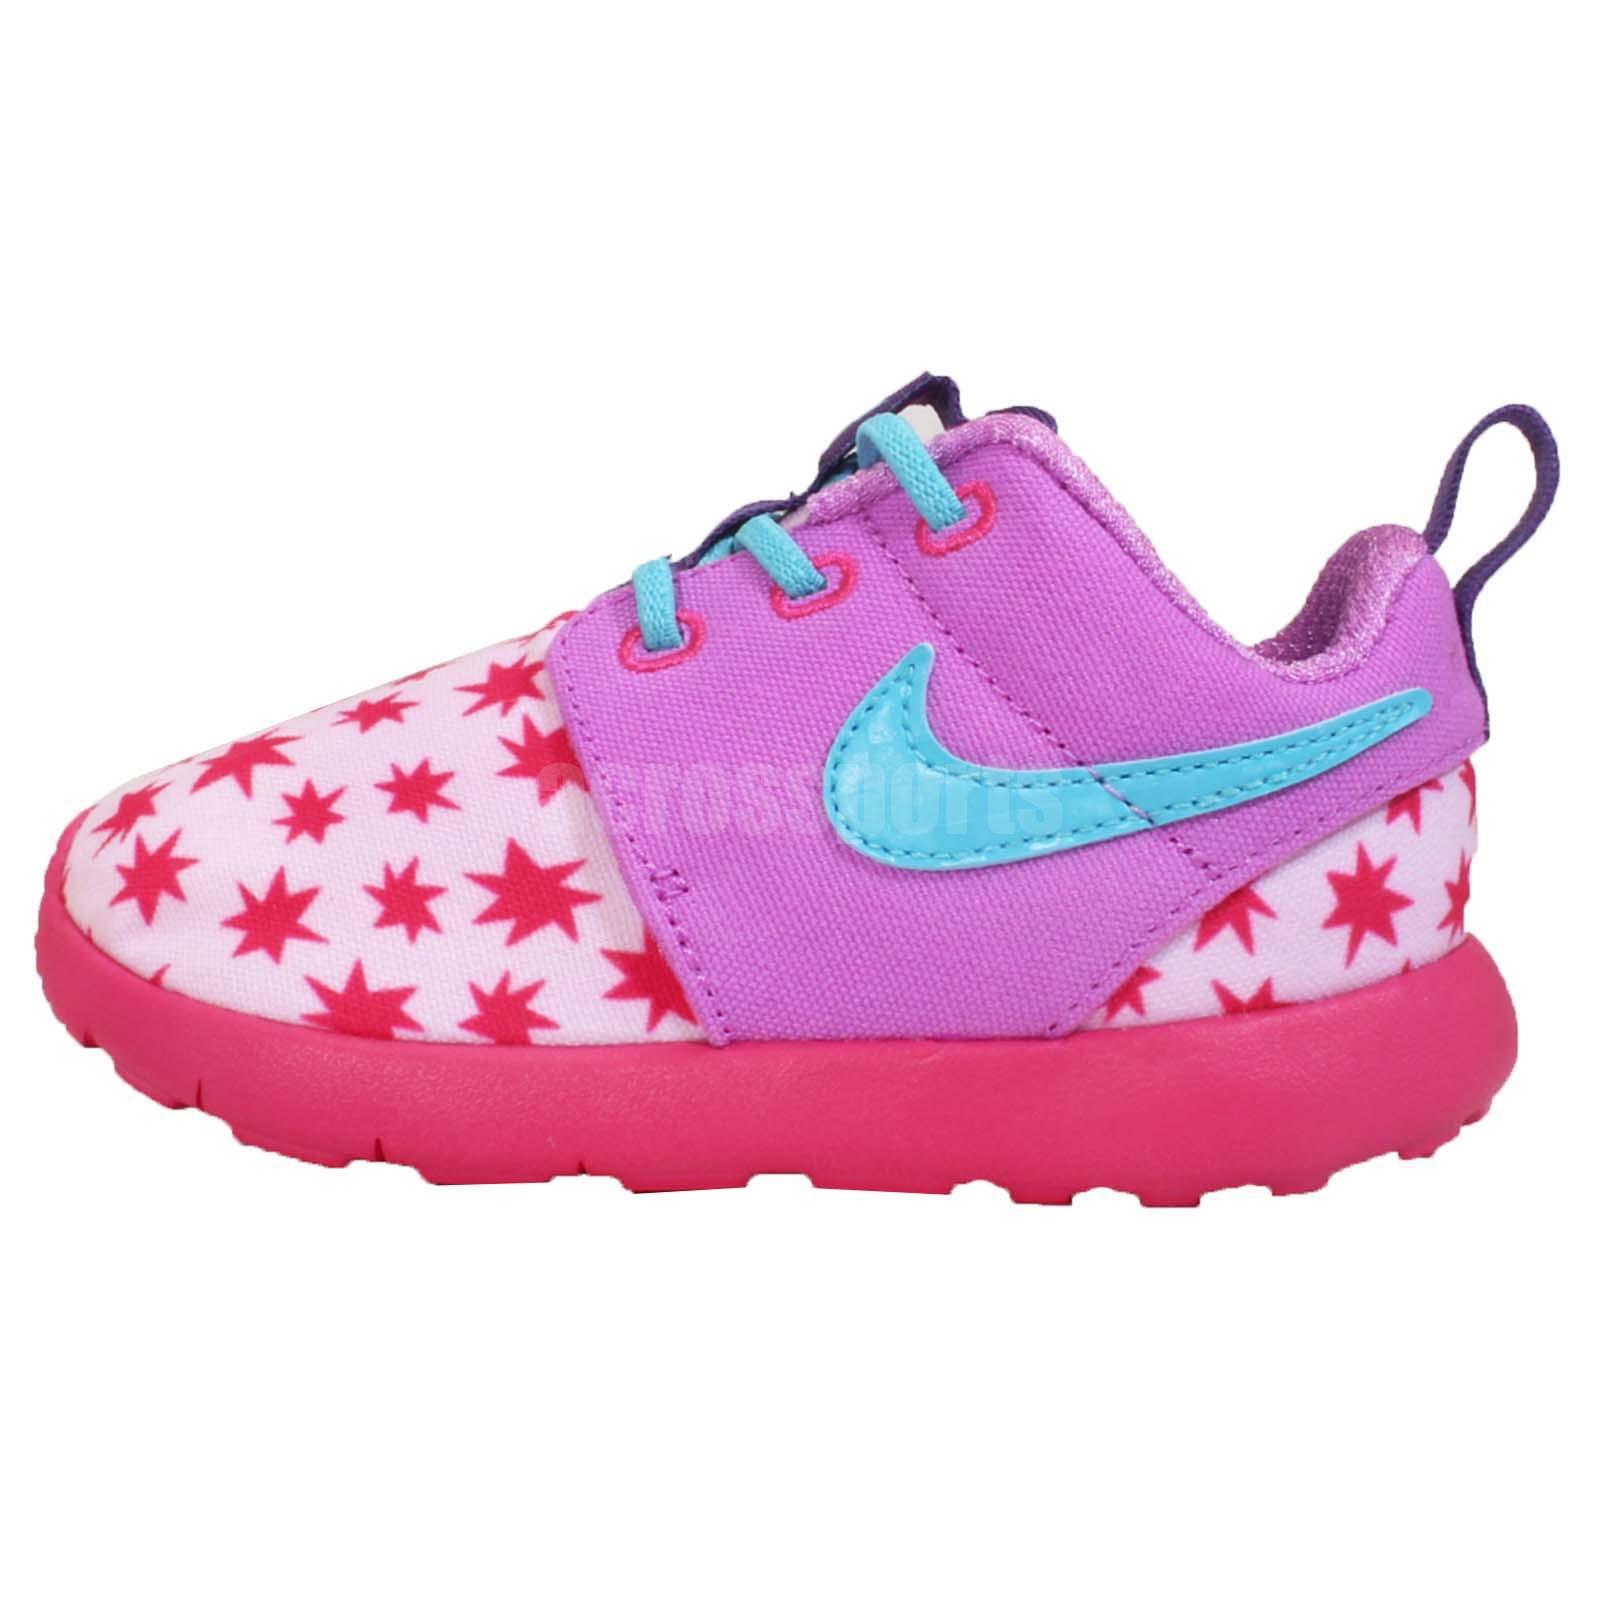 Nike Roshe One Print TDV Rosherun Pink Blue Toddler Baby ...